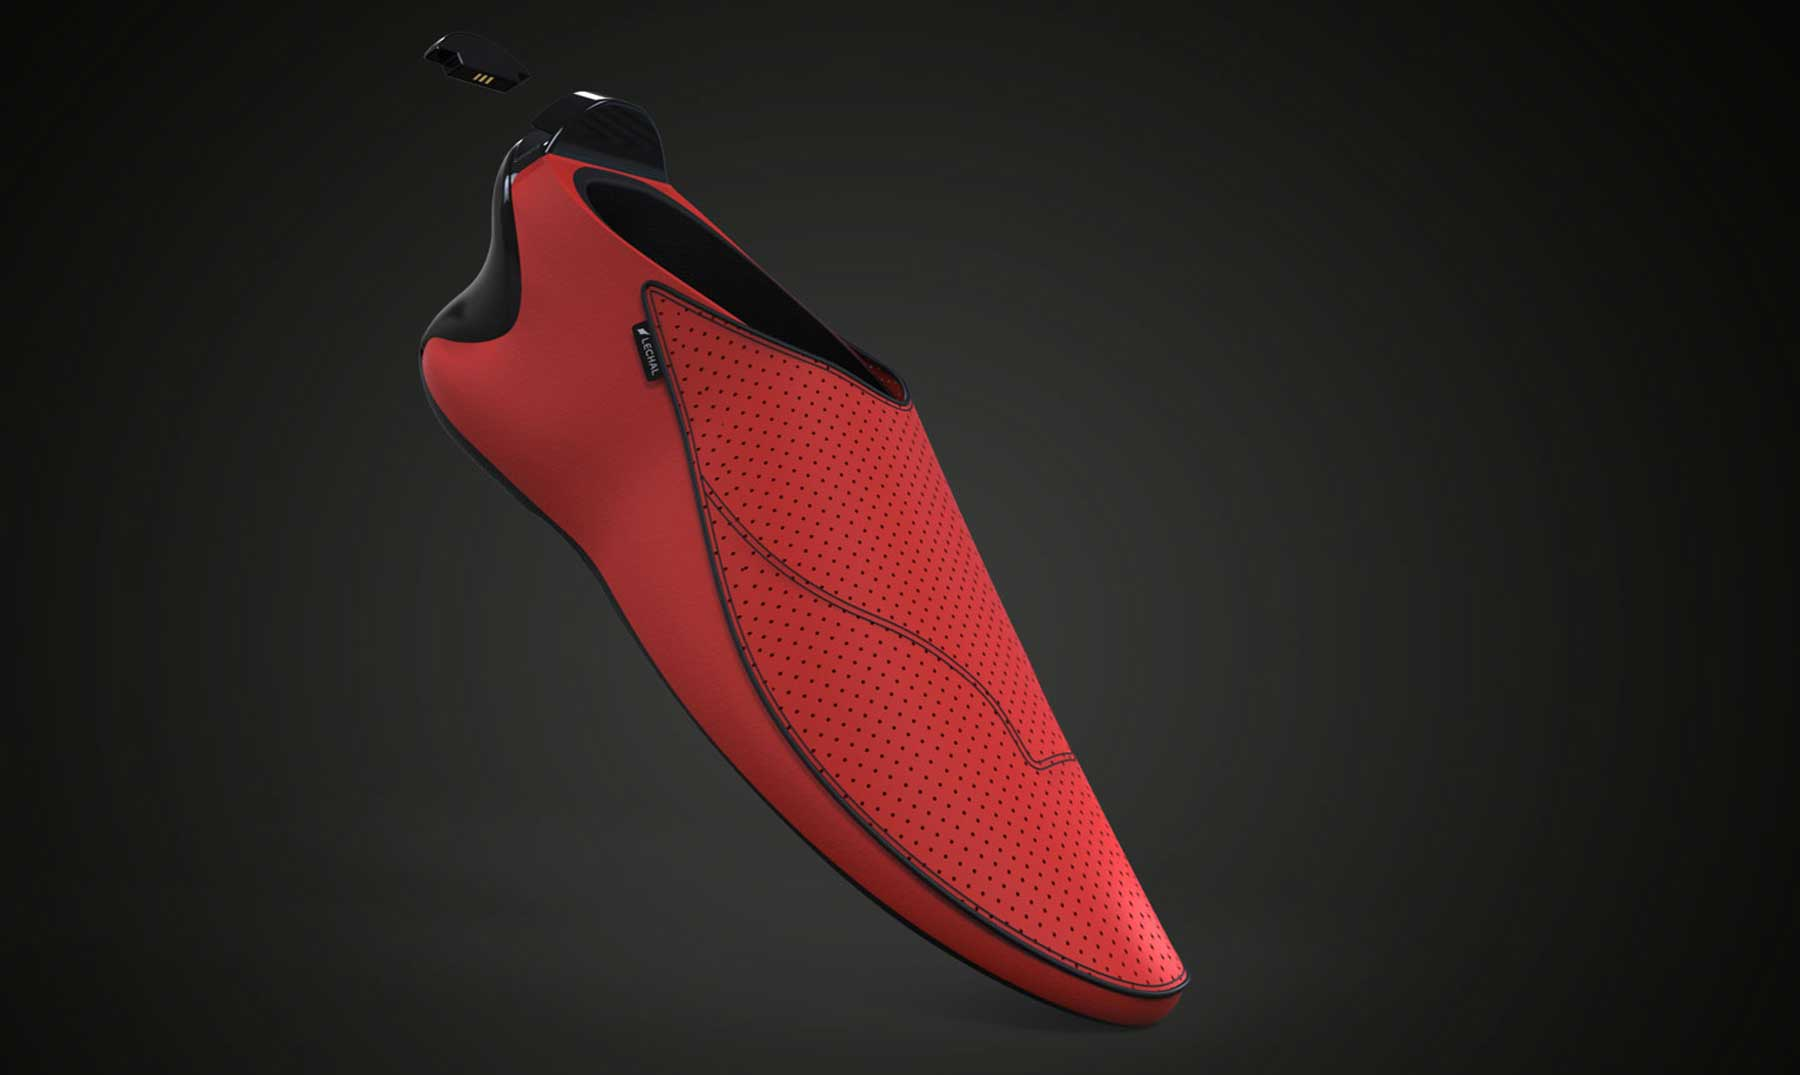 Los zapatos mágicos e inteligentes que te guían